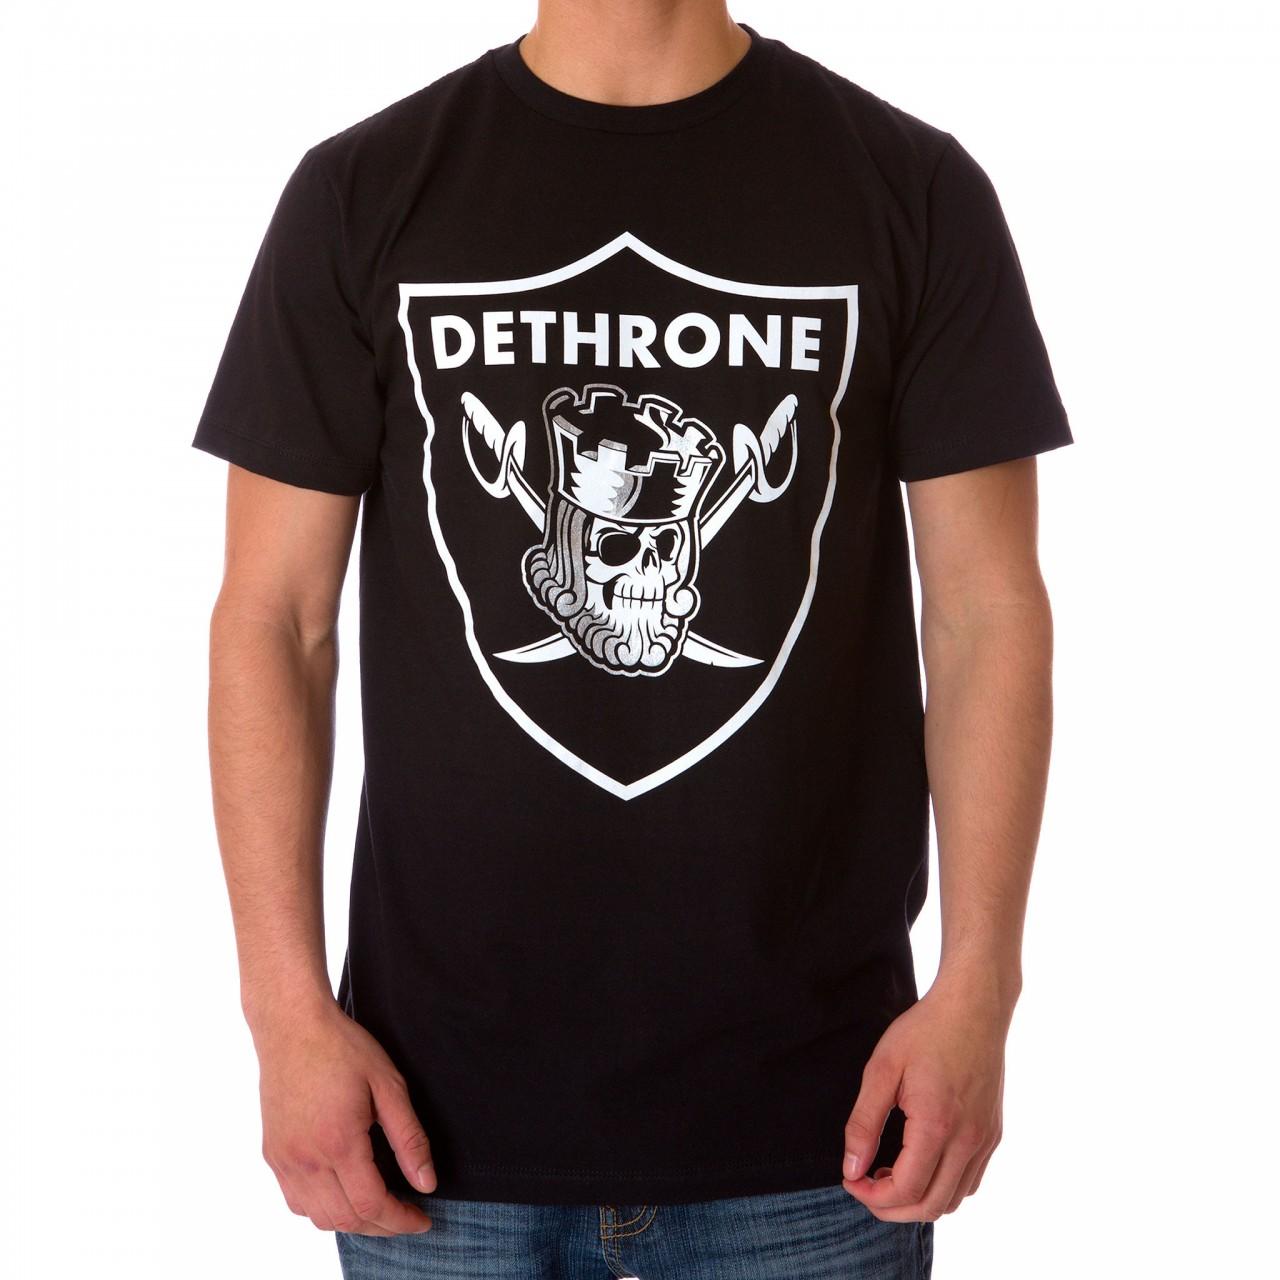 Dethrone Nation tee - Black